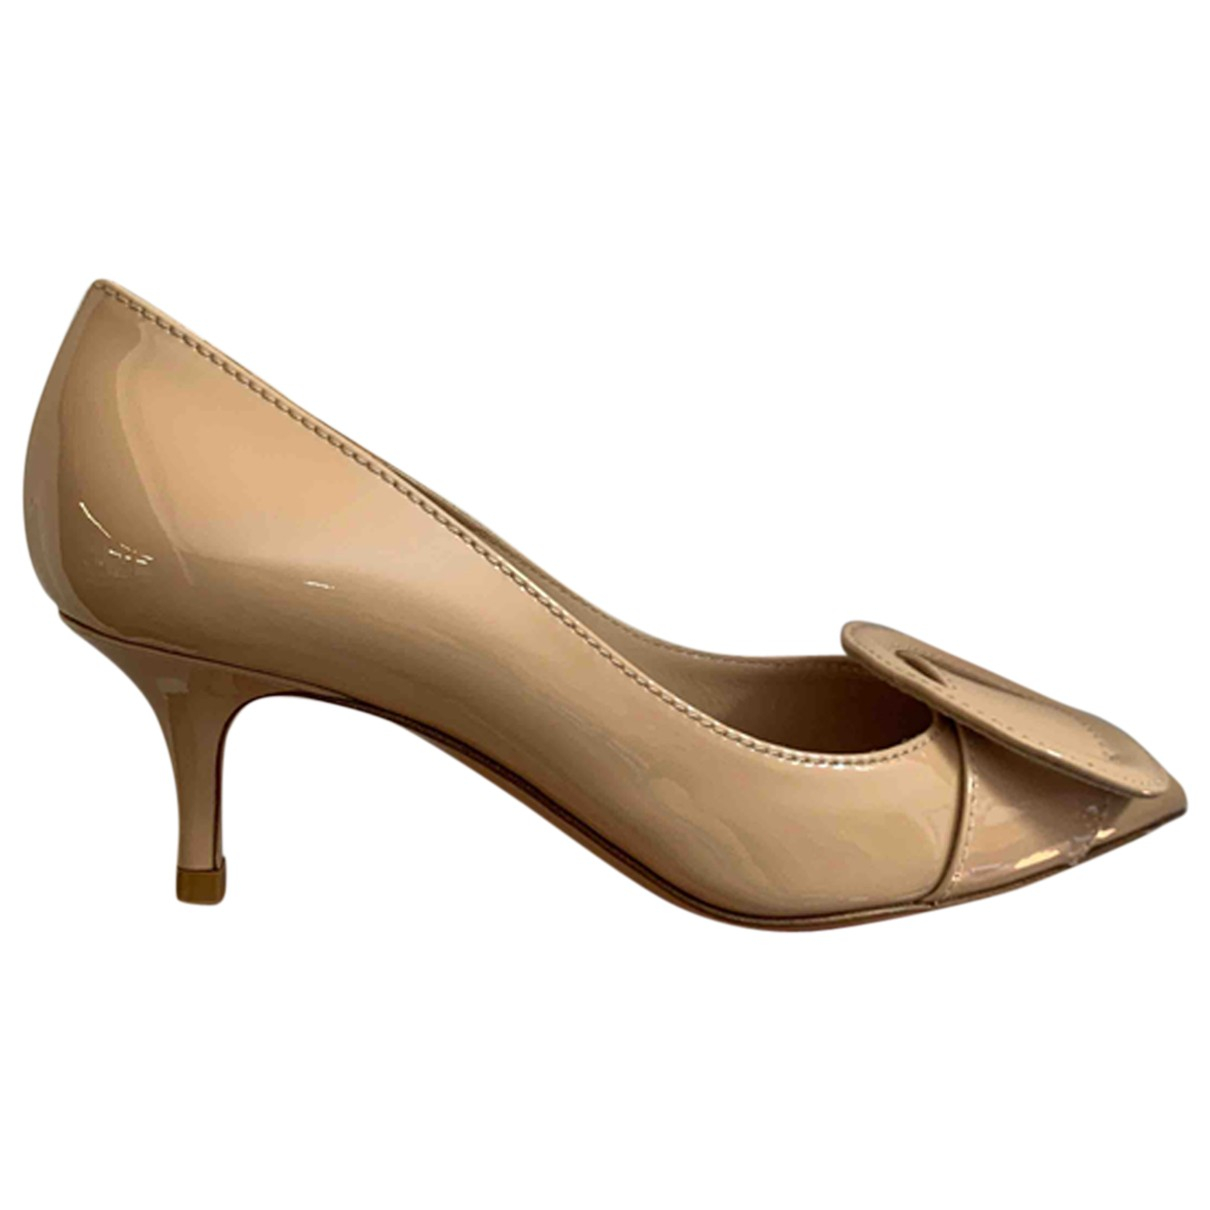 Gianvito Rossi - Escarpins   pour femme en cuir verni - beige